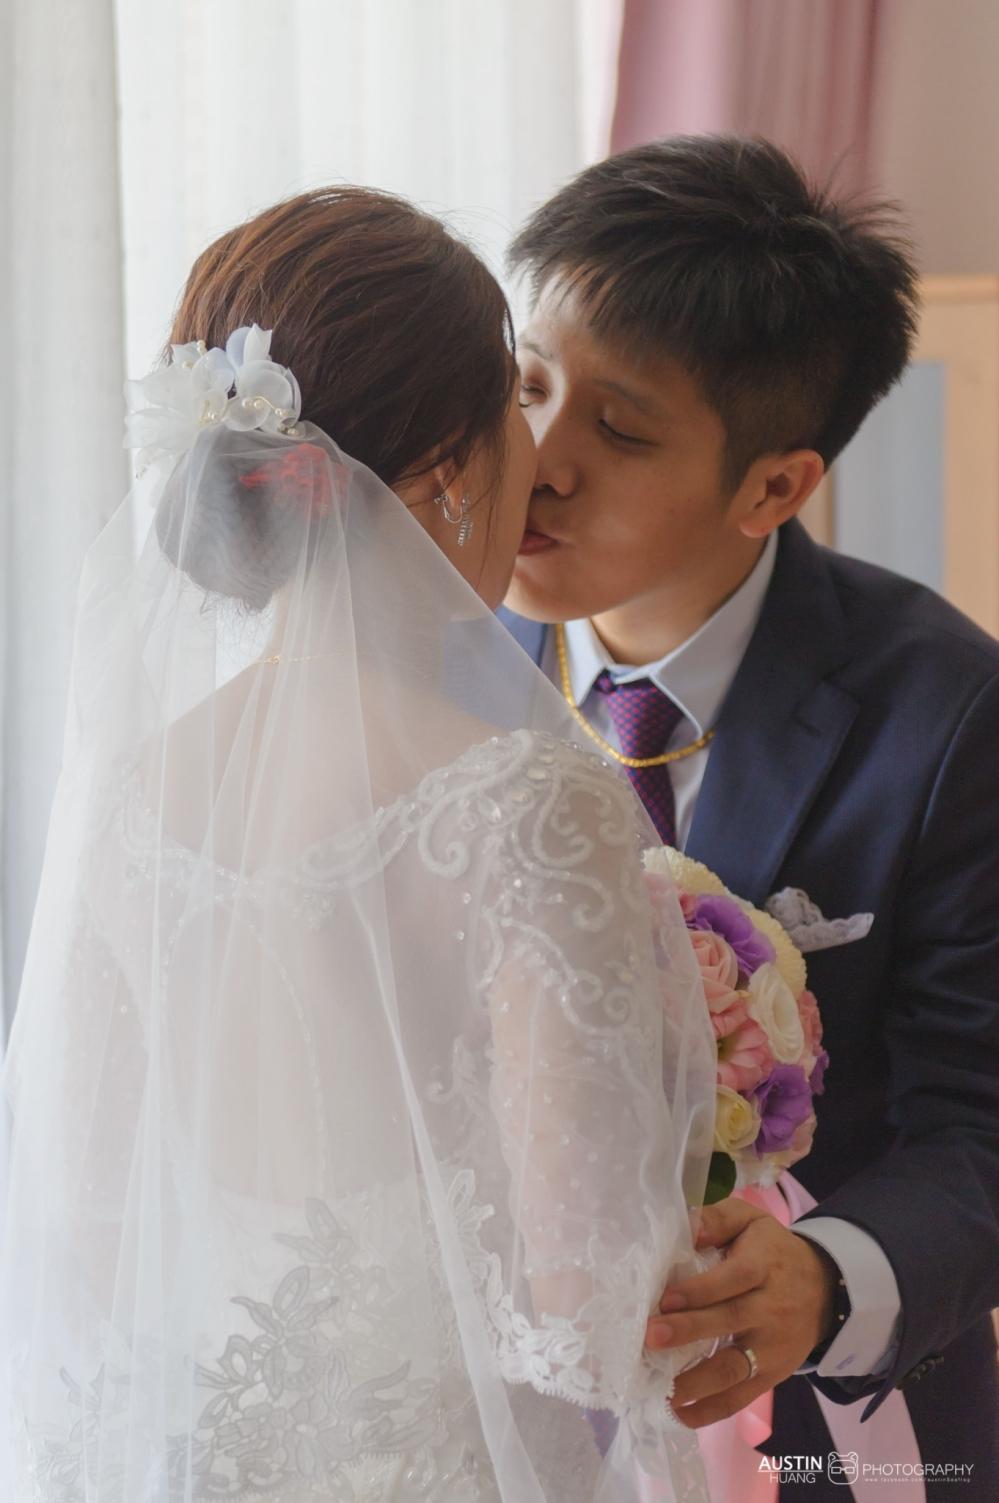 austinseafrog/海蛙攝影/婚禮婚攝海蛙/婚禮紀錄/拍婚禮/The Lin/林酒店